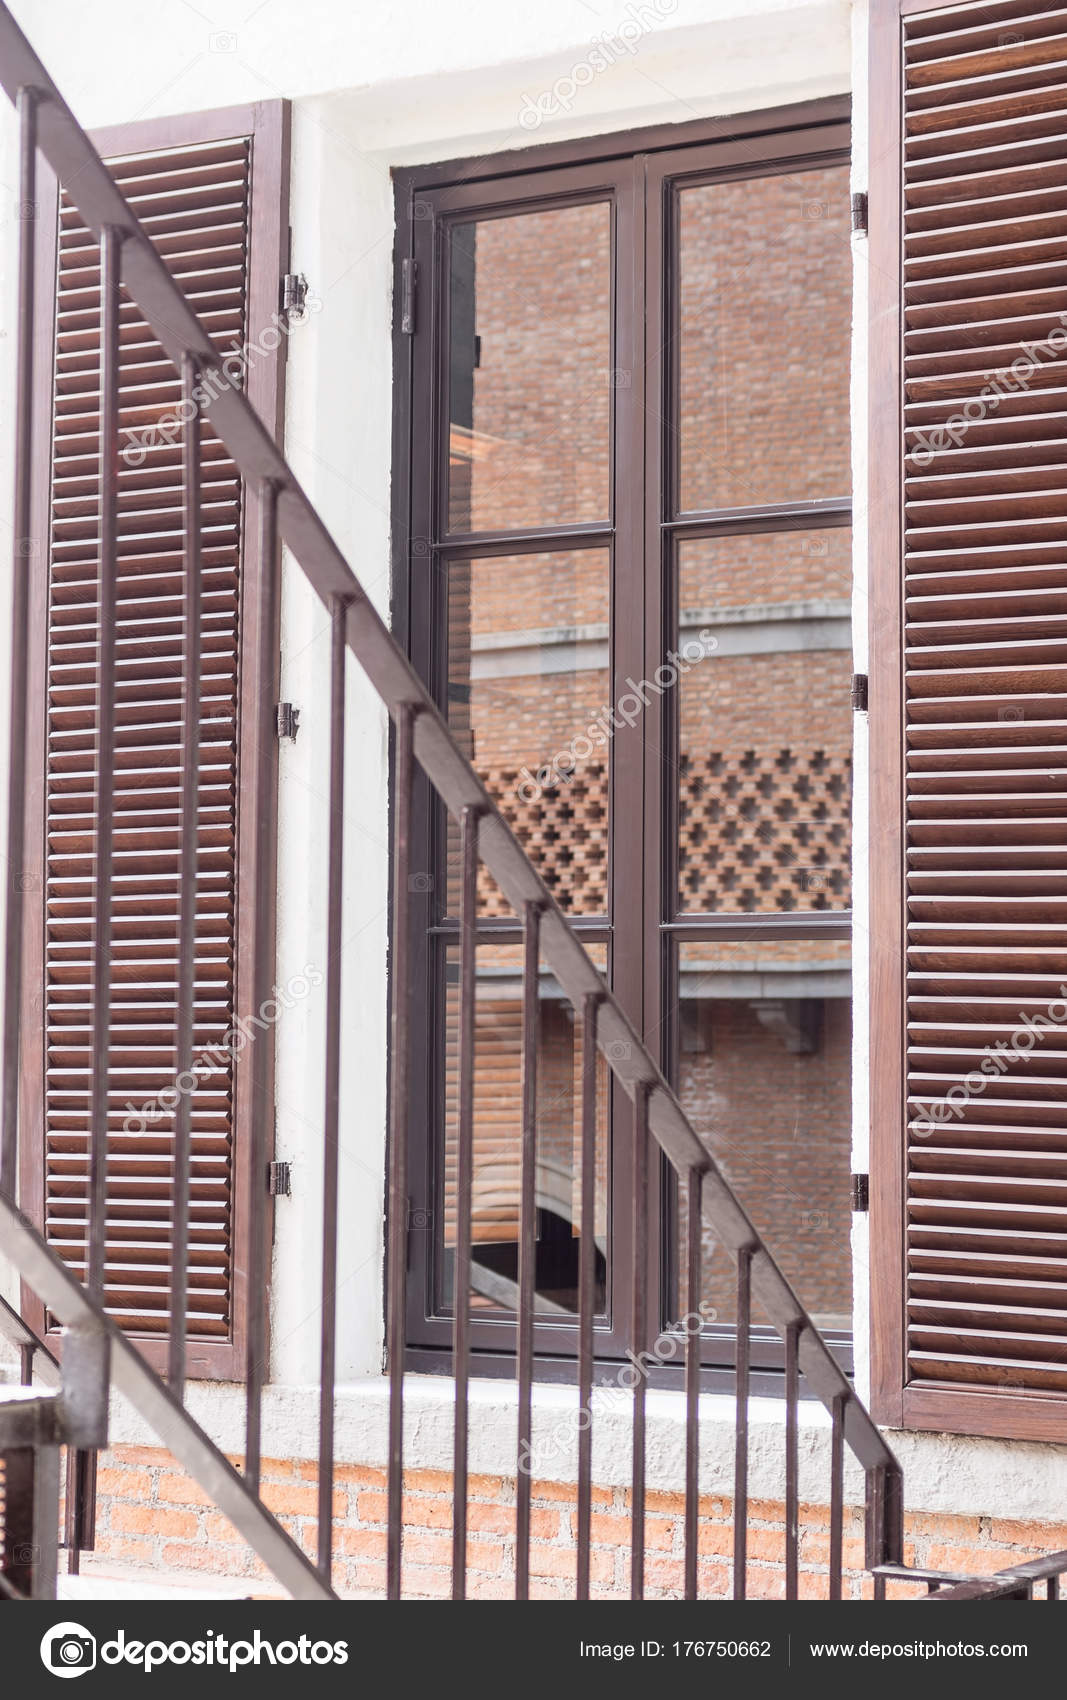 Escadas Inc Ndio Lado Janela Parede Tijolo Reflexo Vidro Fundo